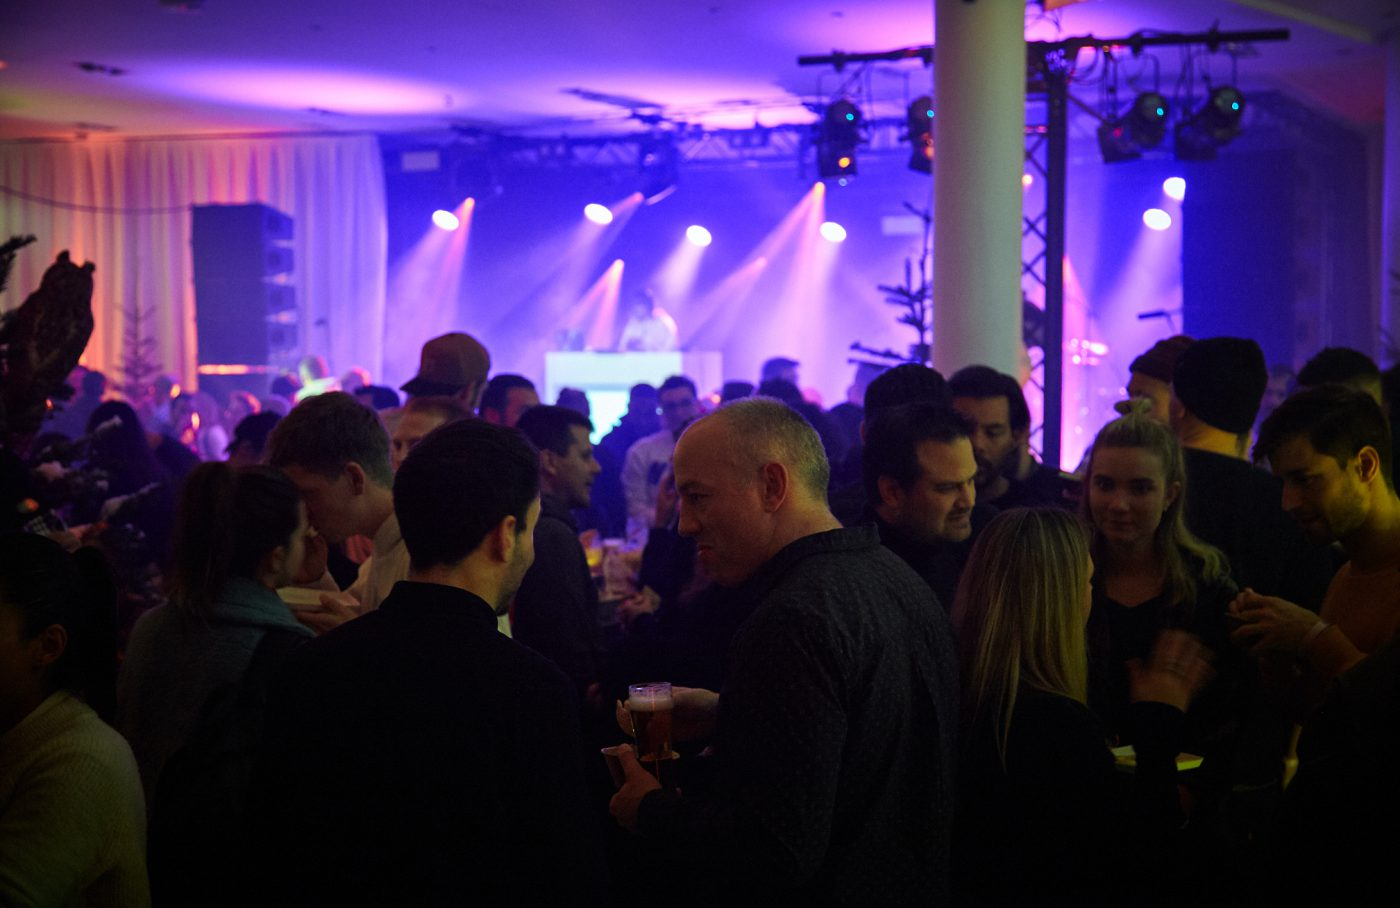 Bedrijfsfeest in Green Lounge Gooiland